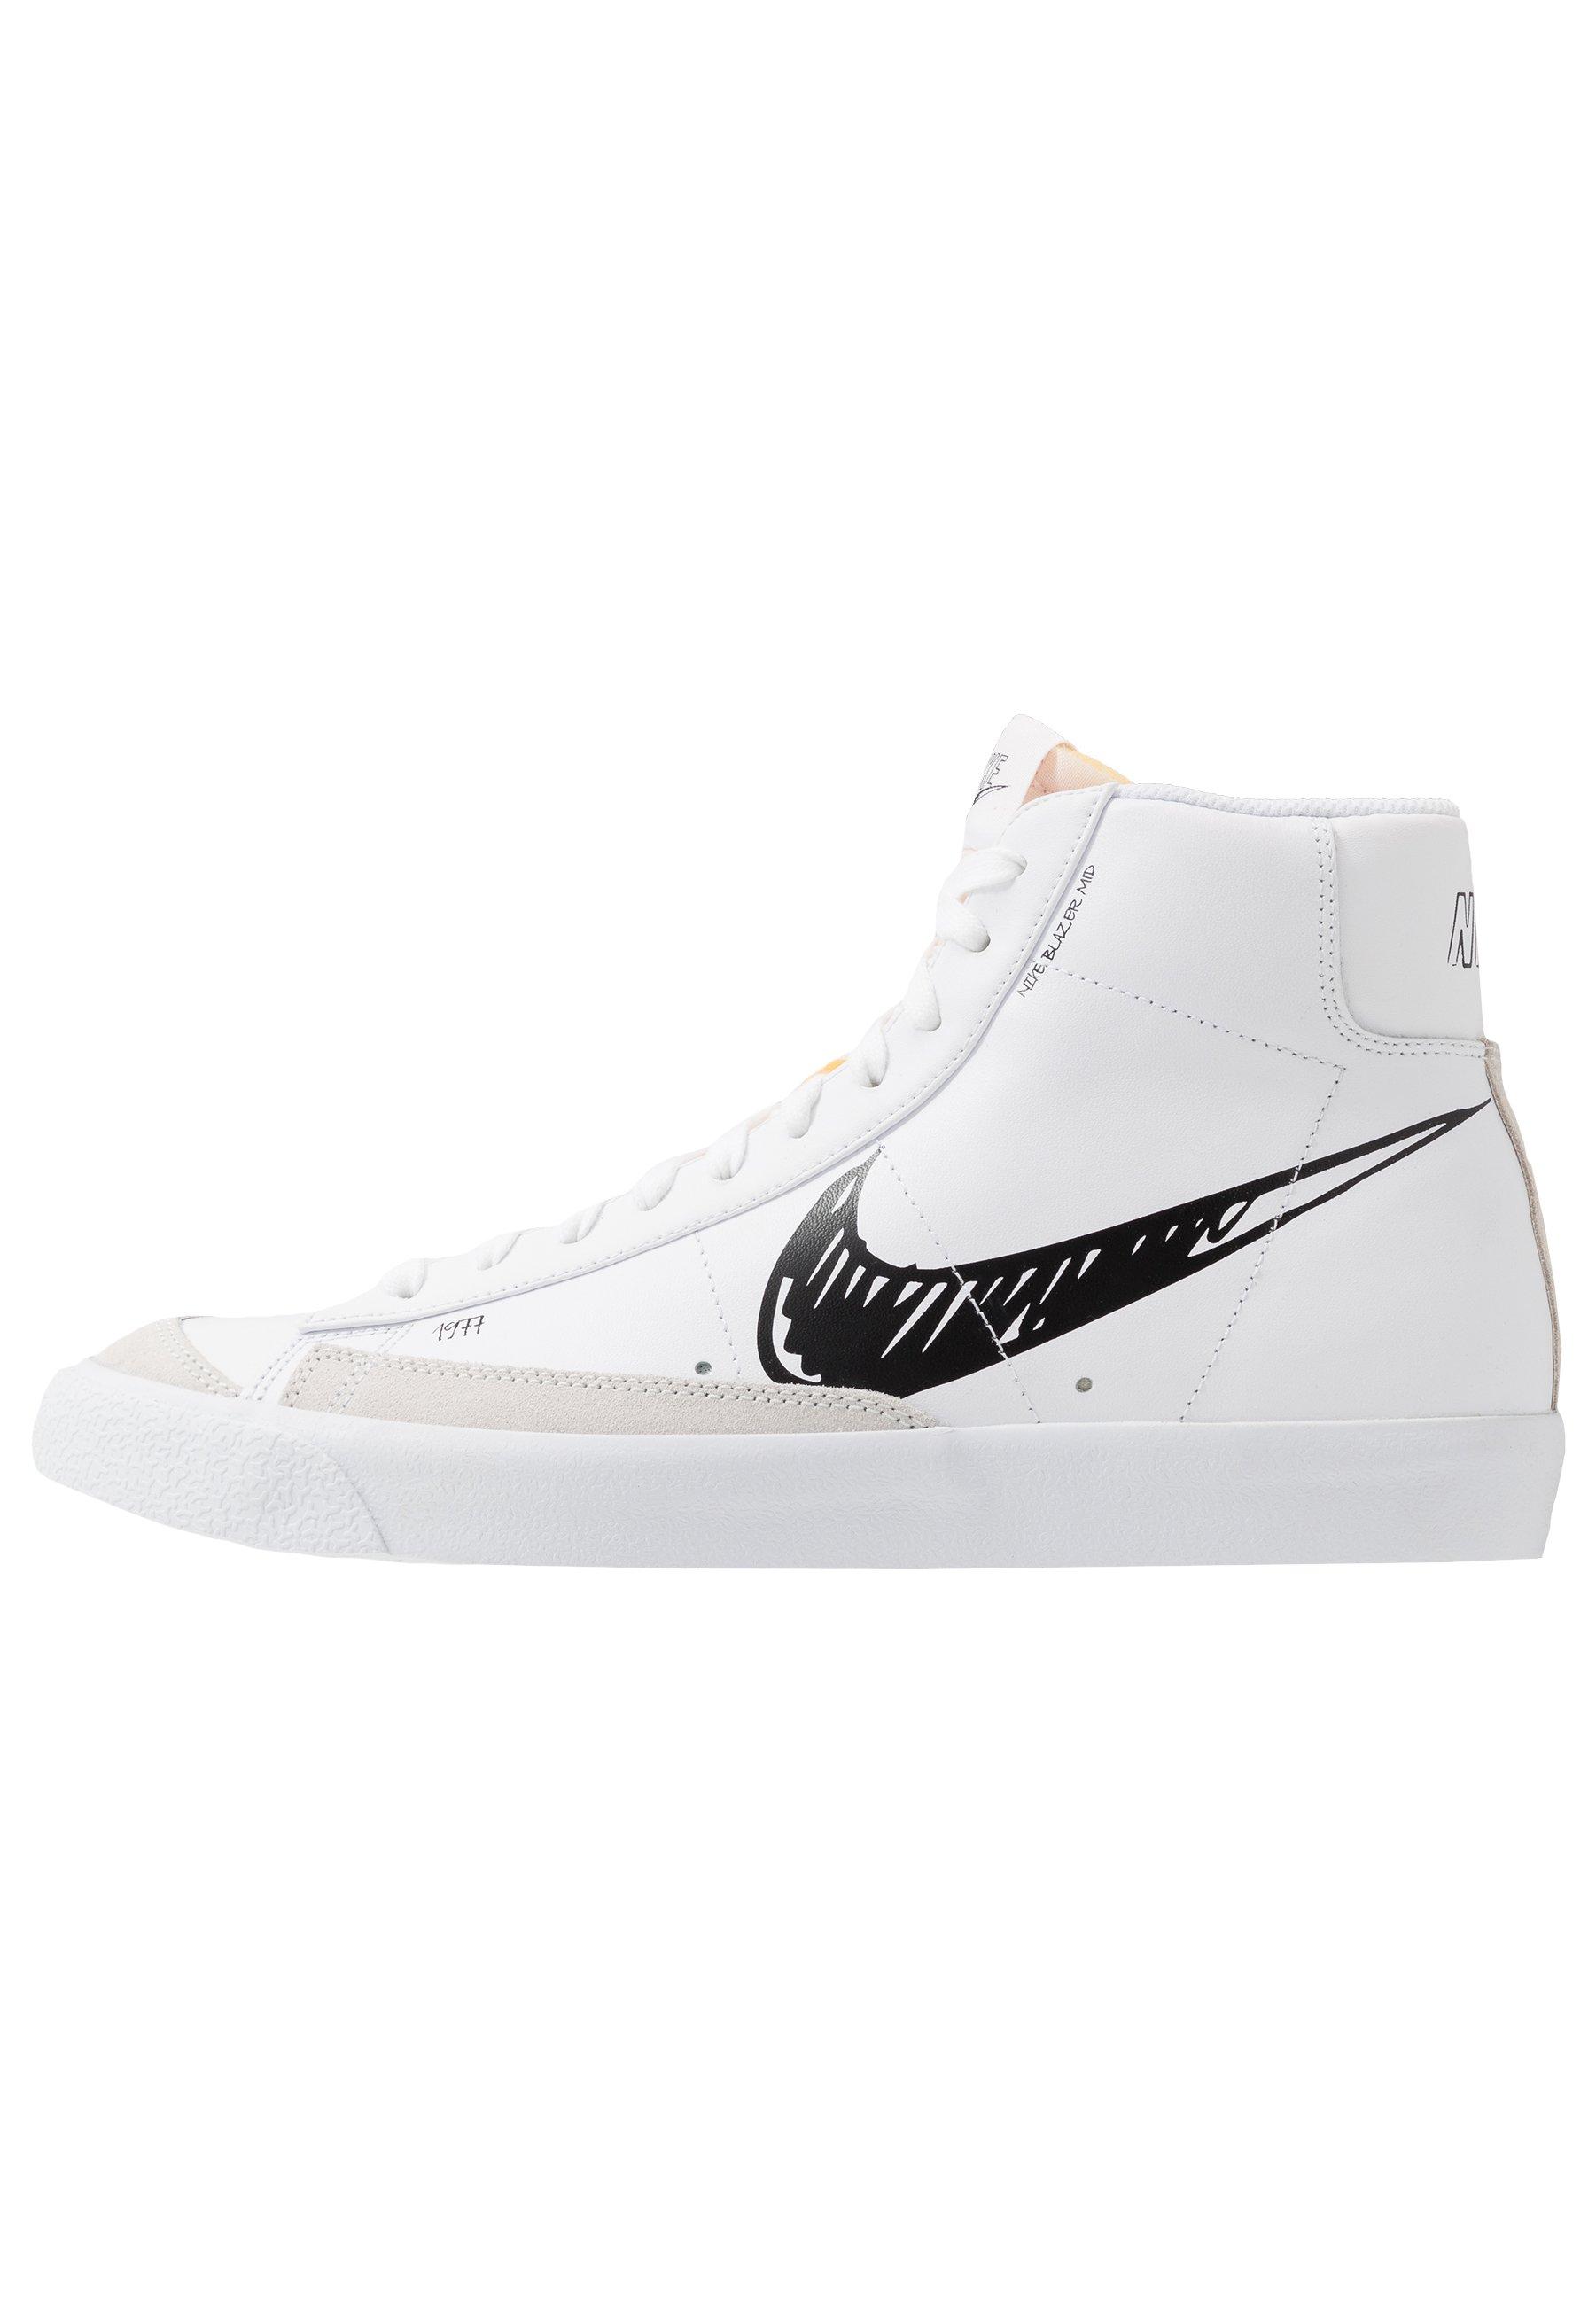 BLAZER MID VNTG '77 Sneakers alte whiteblack